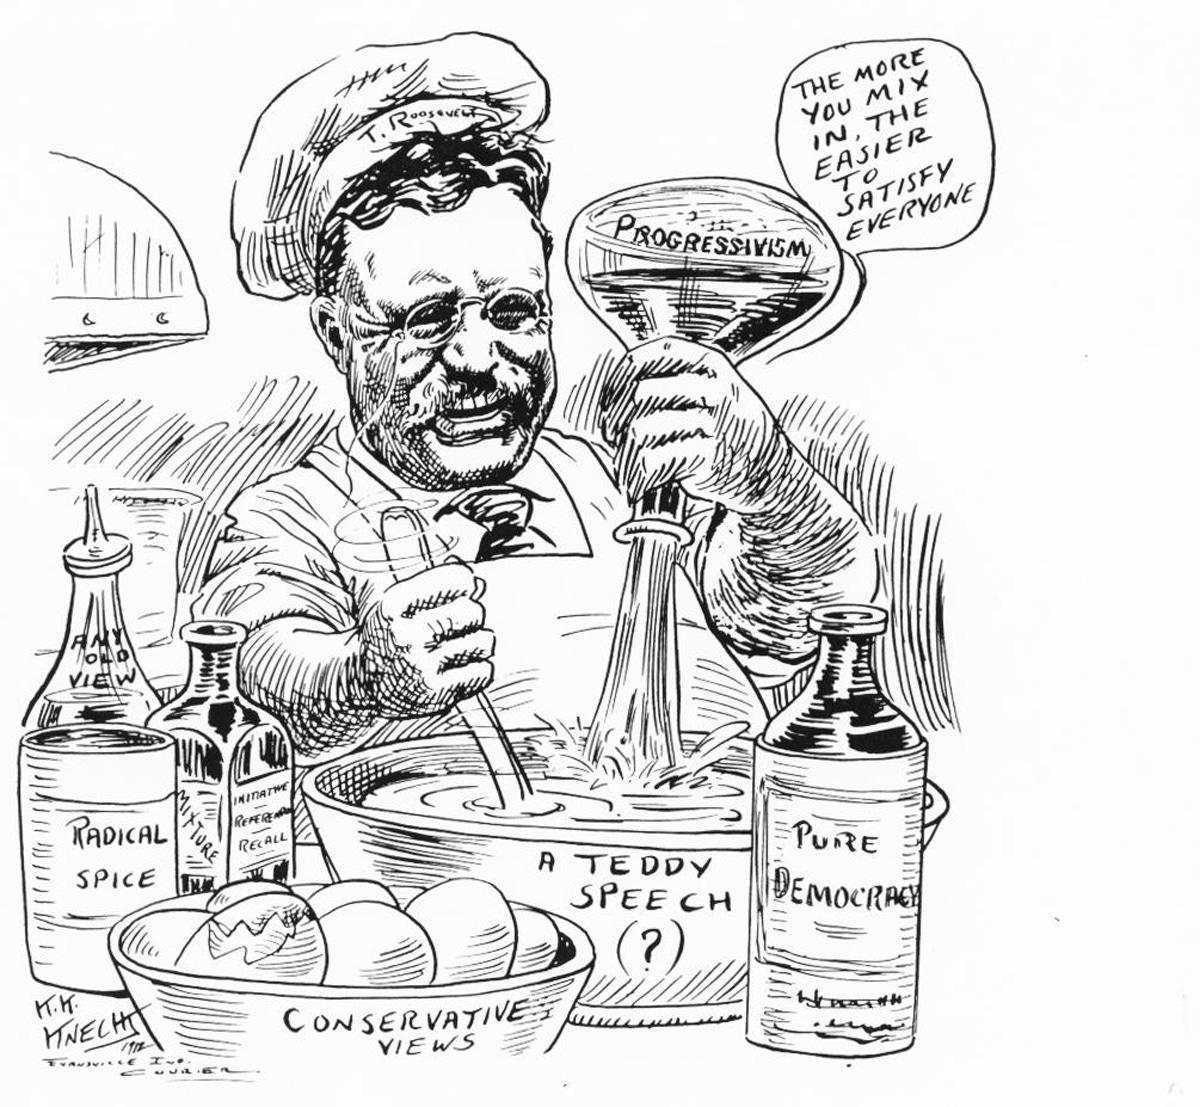 theodore_roosevelt_cartoon_chemist_satterfield_new_nationalism_via Jamesstrock.substack.com